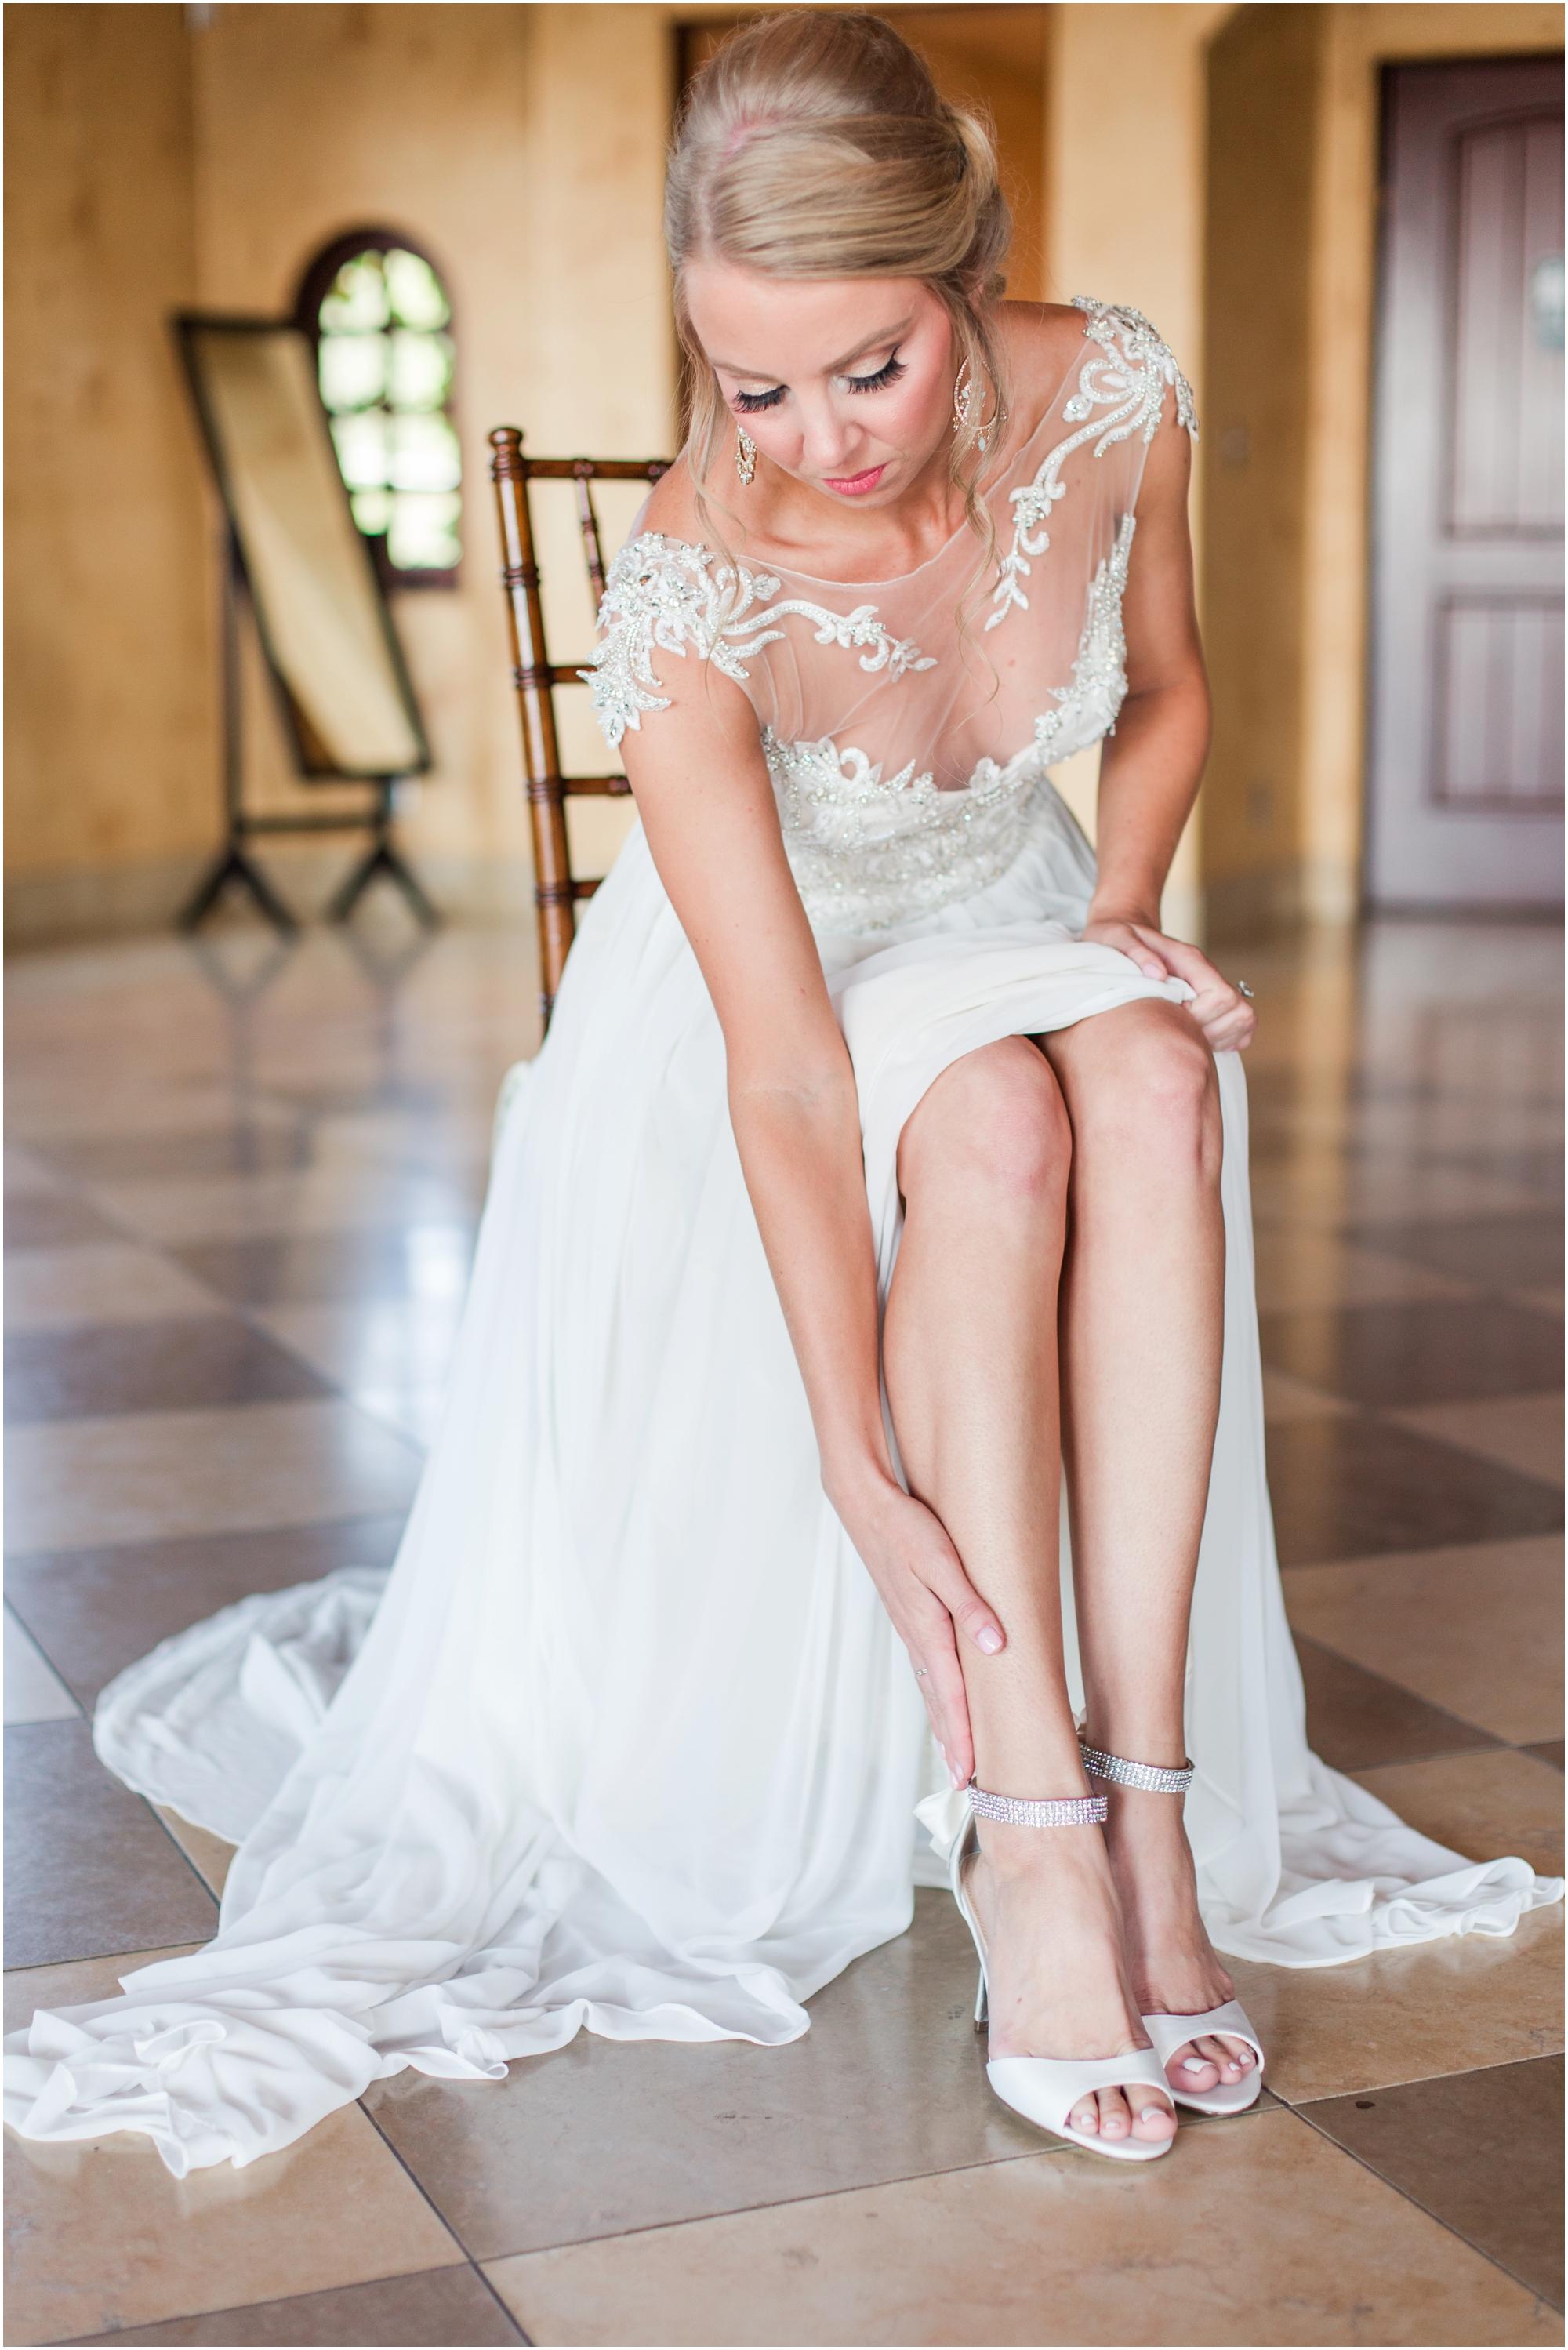 Regale Winery Wedding photos by Briana Calderon Photography_0597.jpg